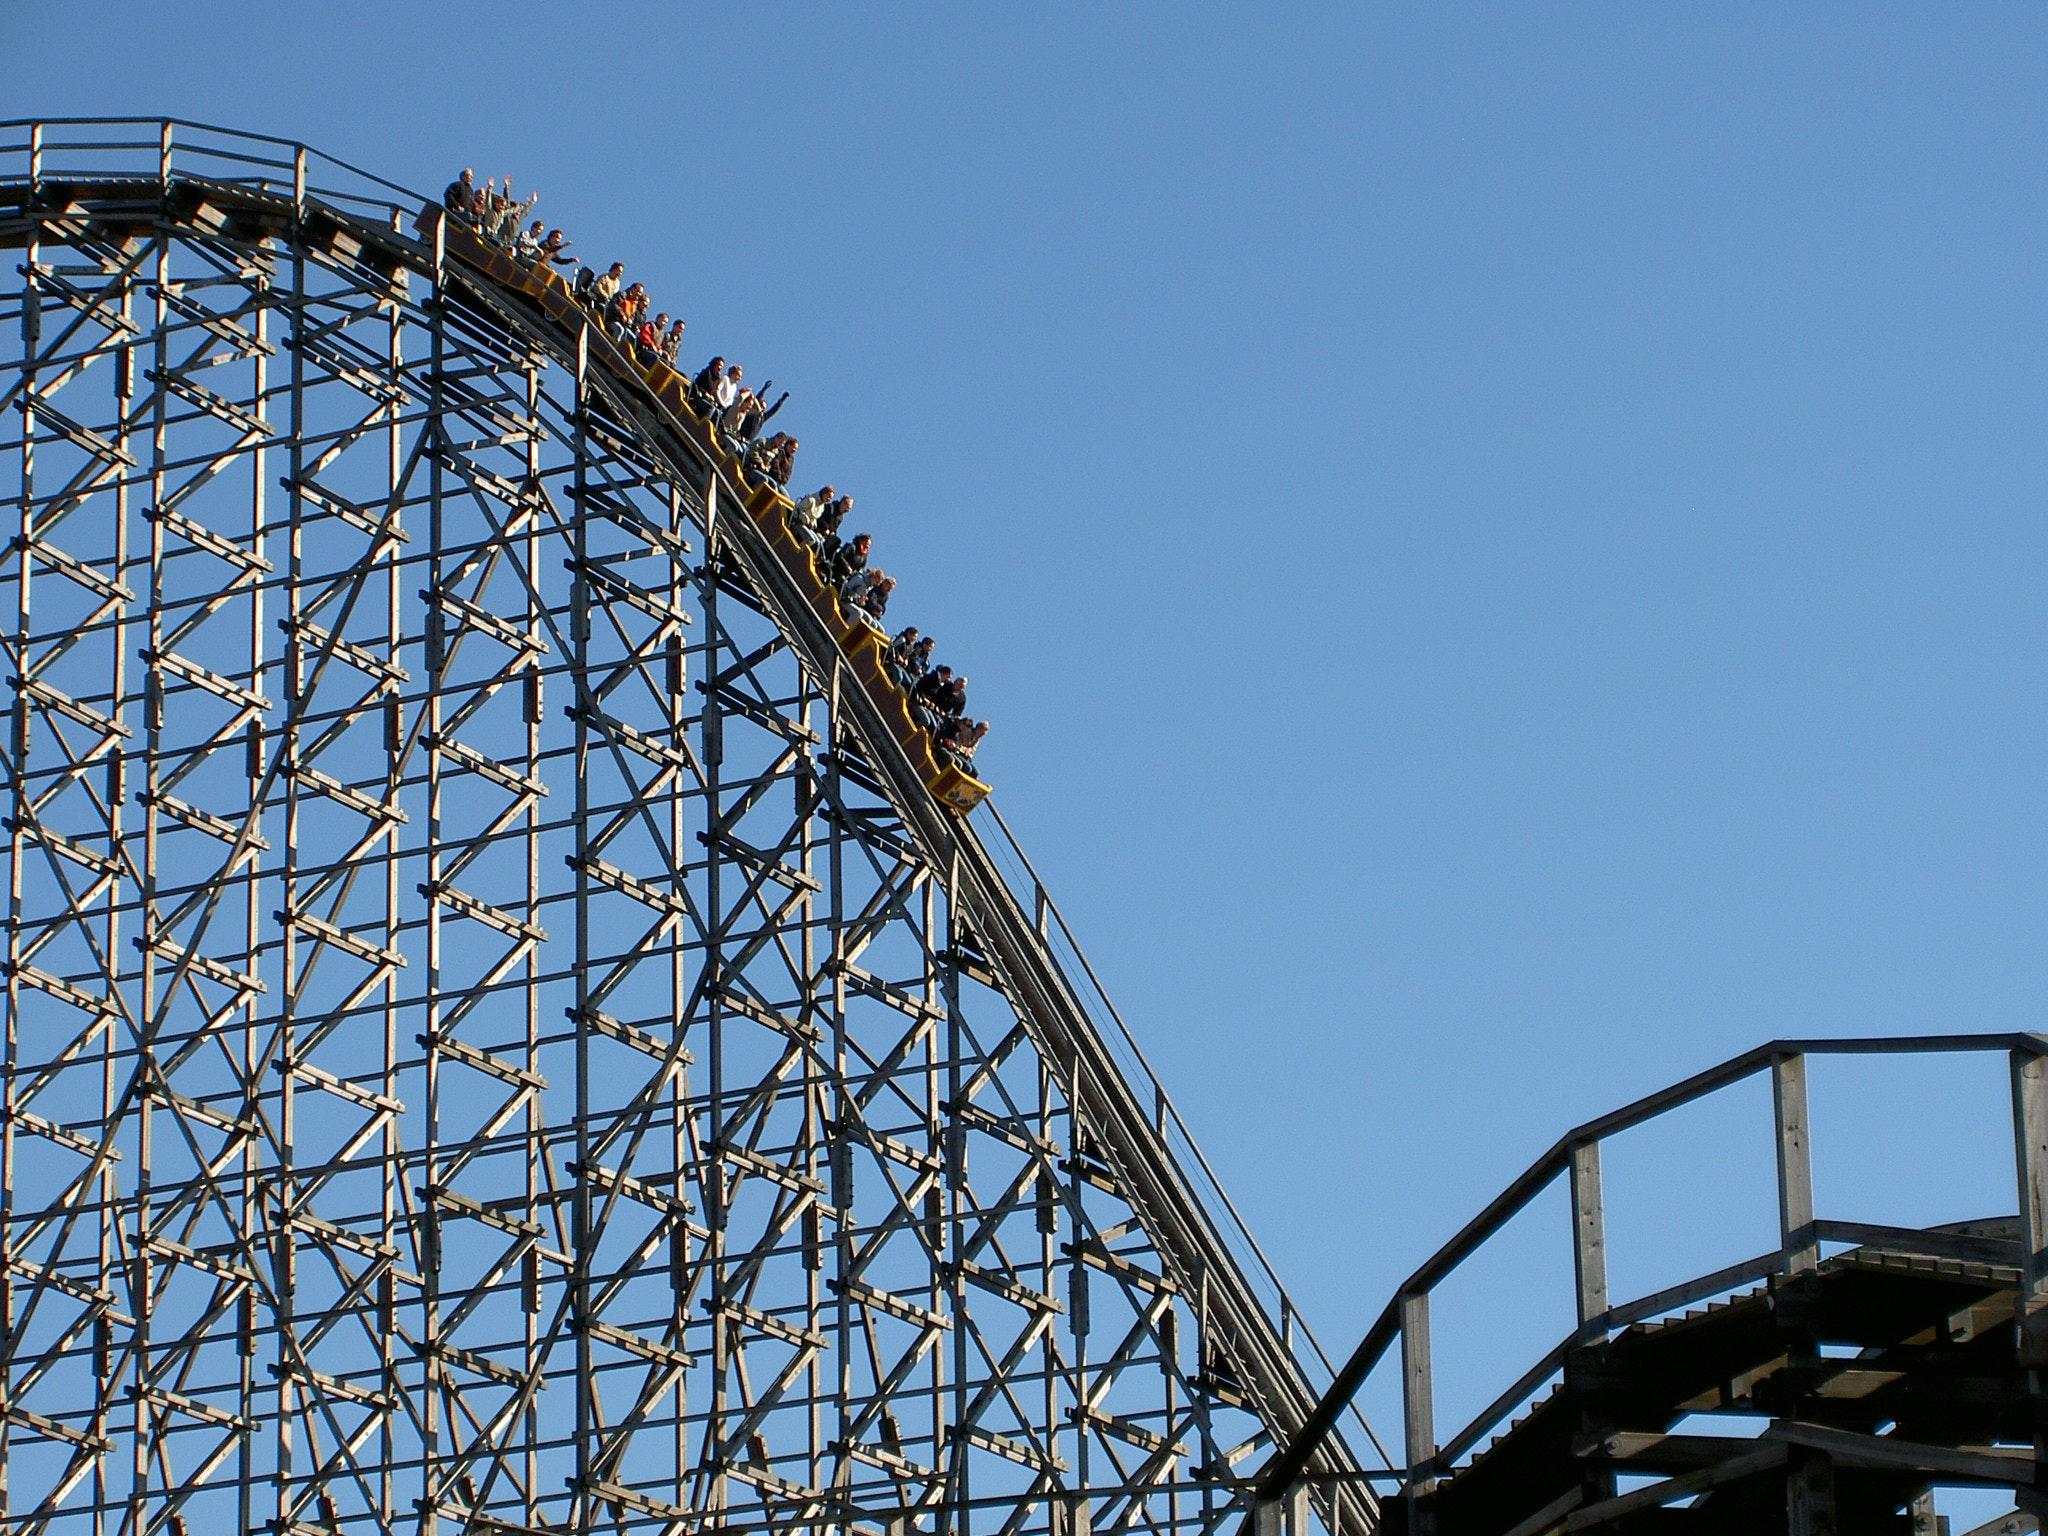 40+ great roller coaster photos · pexels · free stock photos